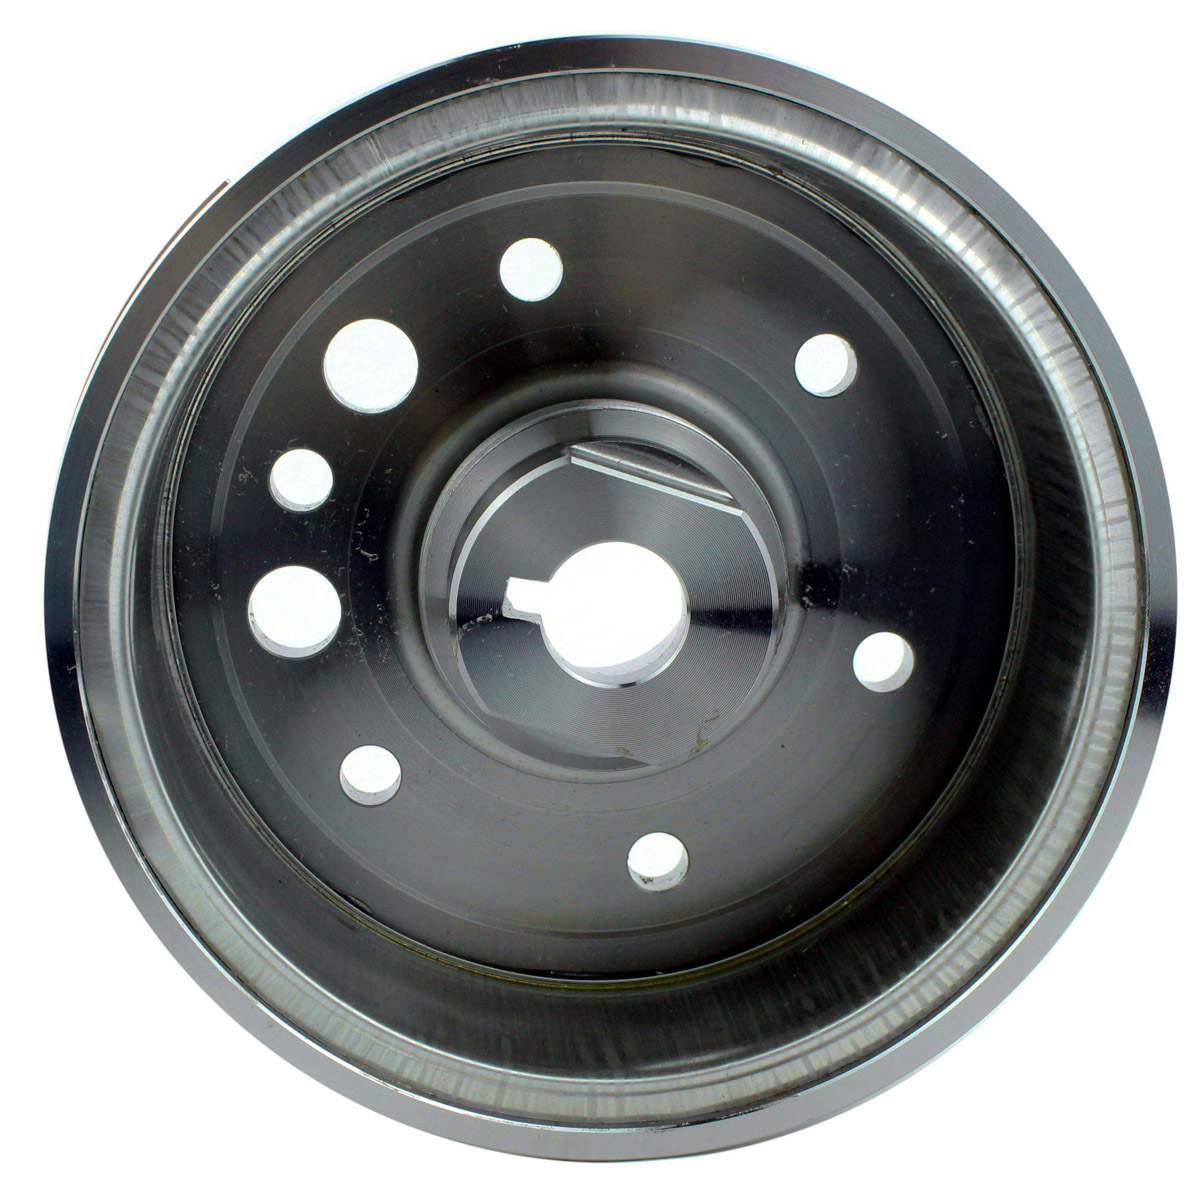 Kit-Flywheel-Puller-Stator-Arctic-Cat-TBX-TRV-400-4x4-Auto-2004-2005-2006